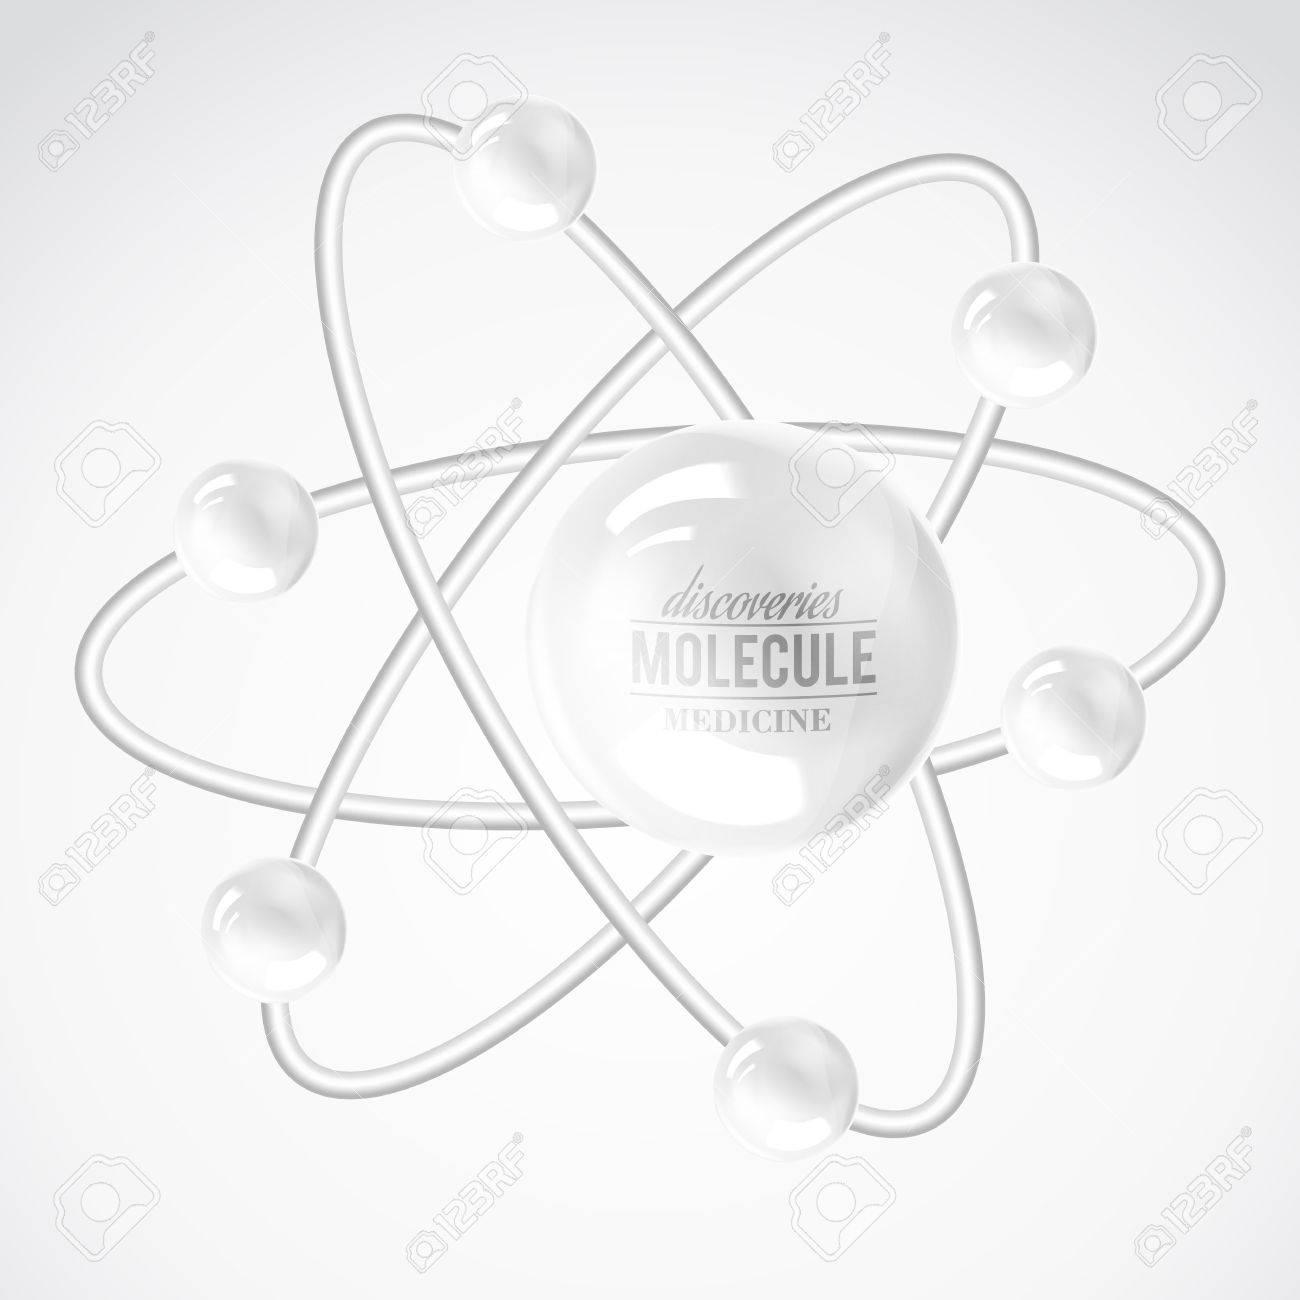 Molecule icon over white. Vector illustration. Stock Vector - 25929914